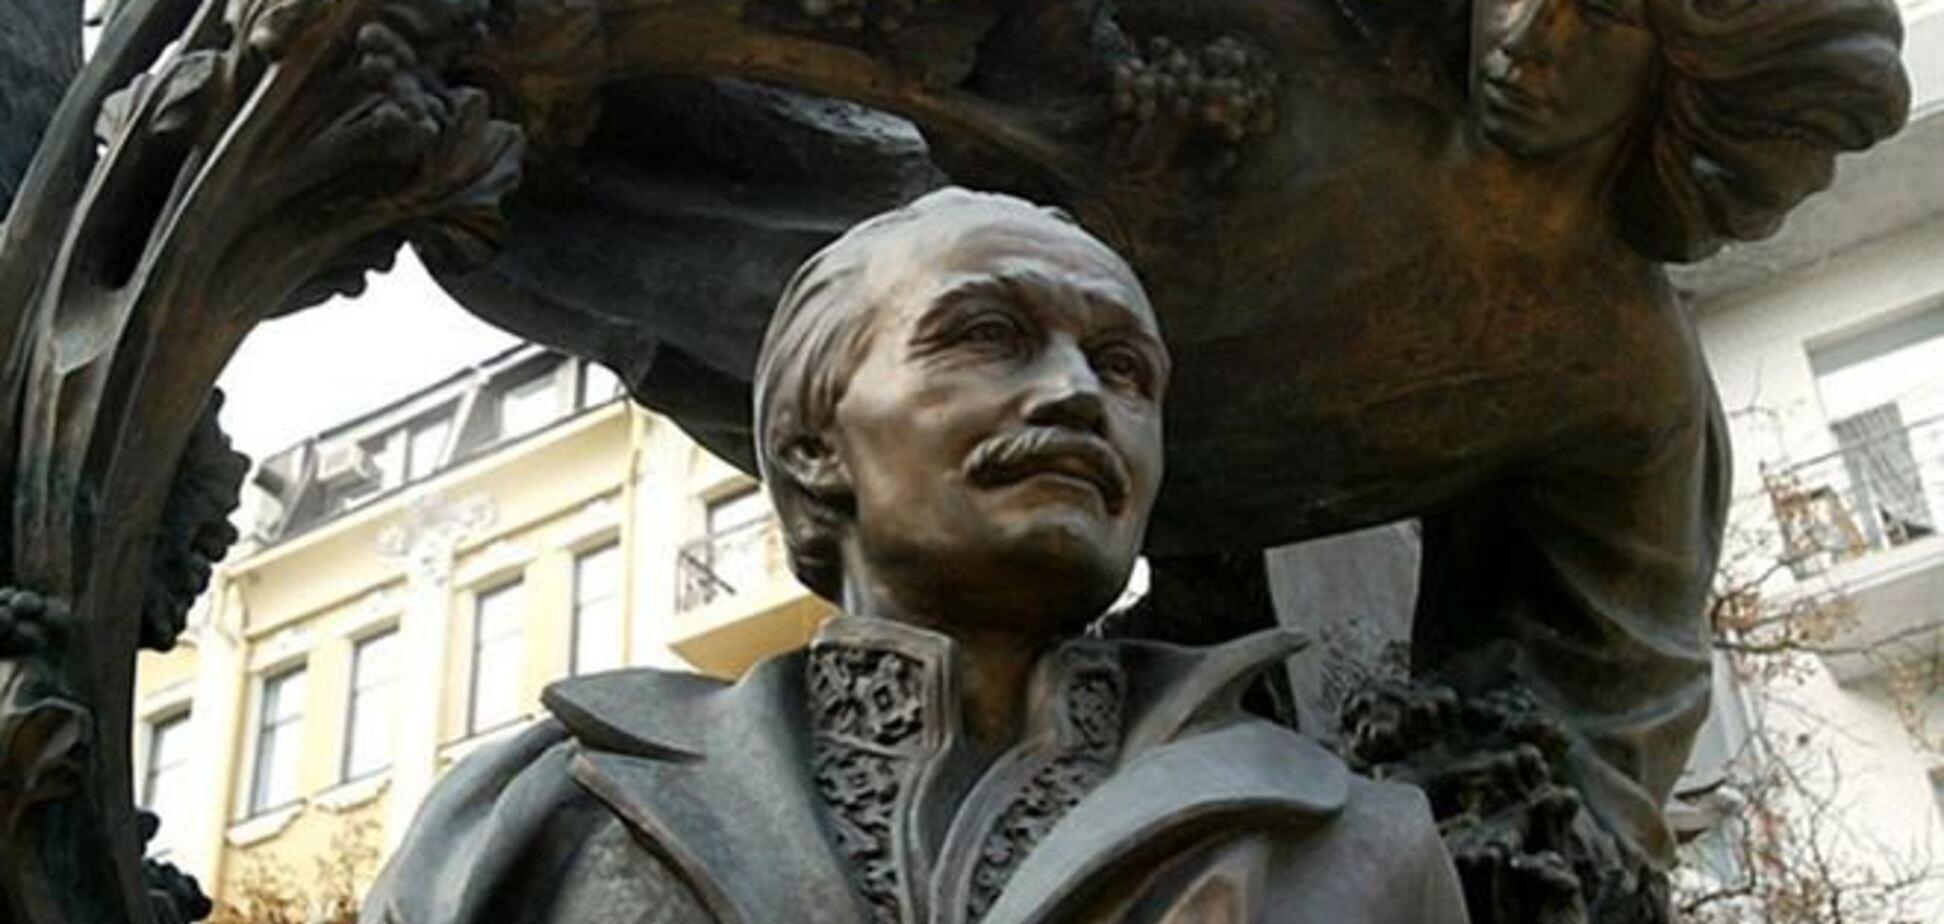 15 лет назад погиб Вячеслав Чорновил. Мудрые слова борца за Украину